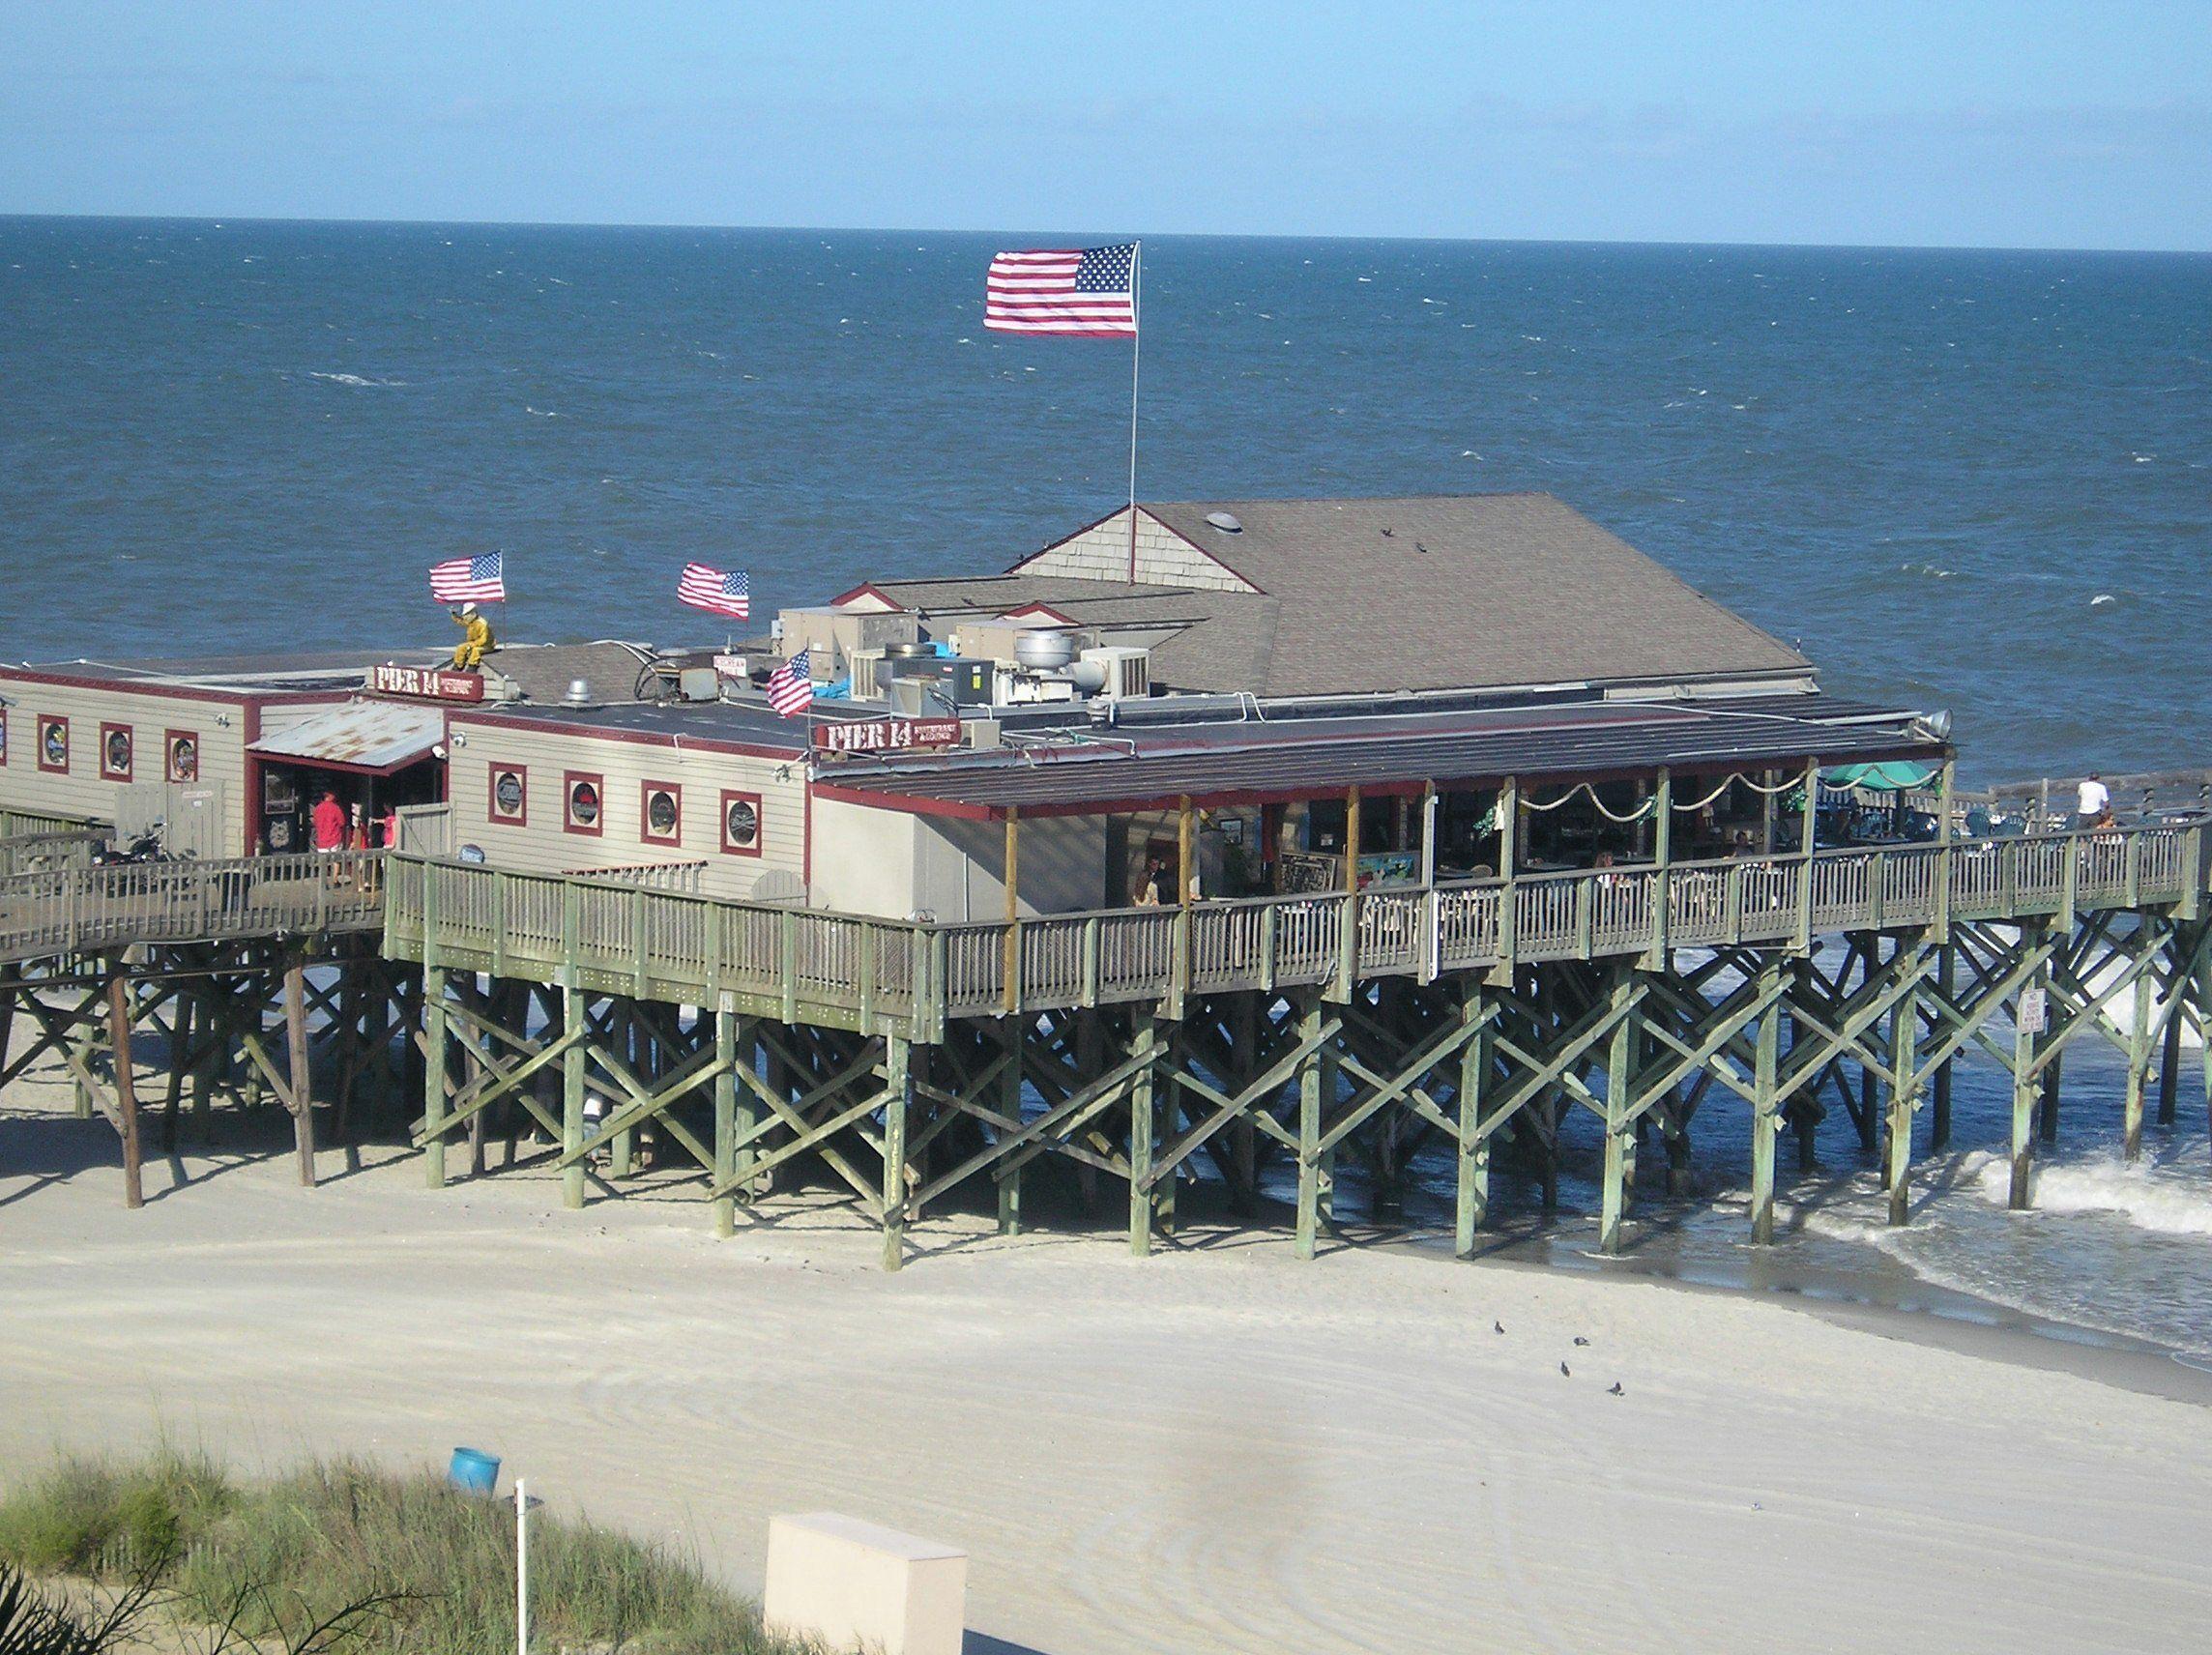 pier 14 myrtle beach sc myrtle beach myrtle beach south rh pinterest com